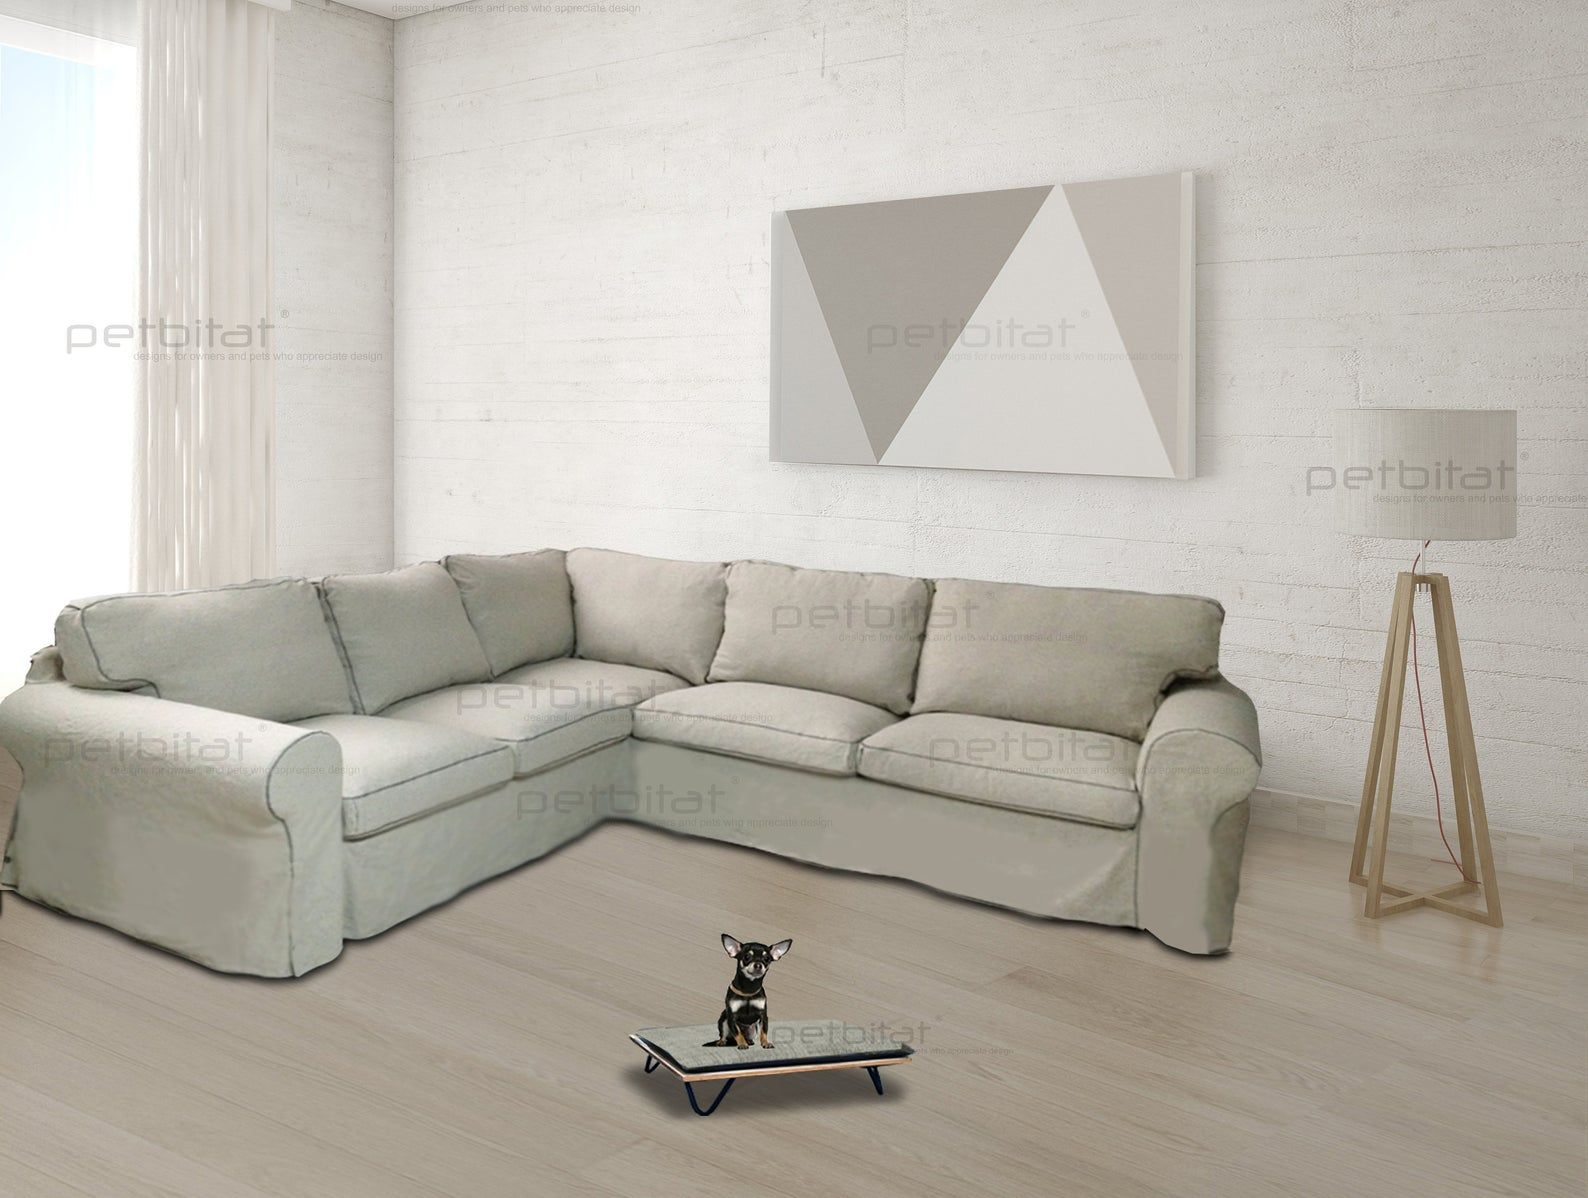 Ikea Ektorp 2 2 Seat Sectional Sofa Cover Ikea Ektorp Slipcover